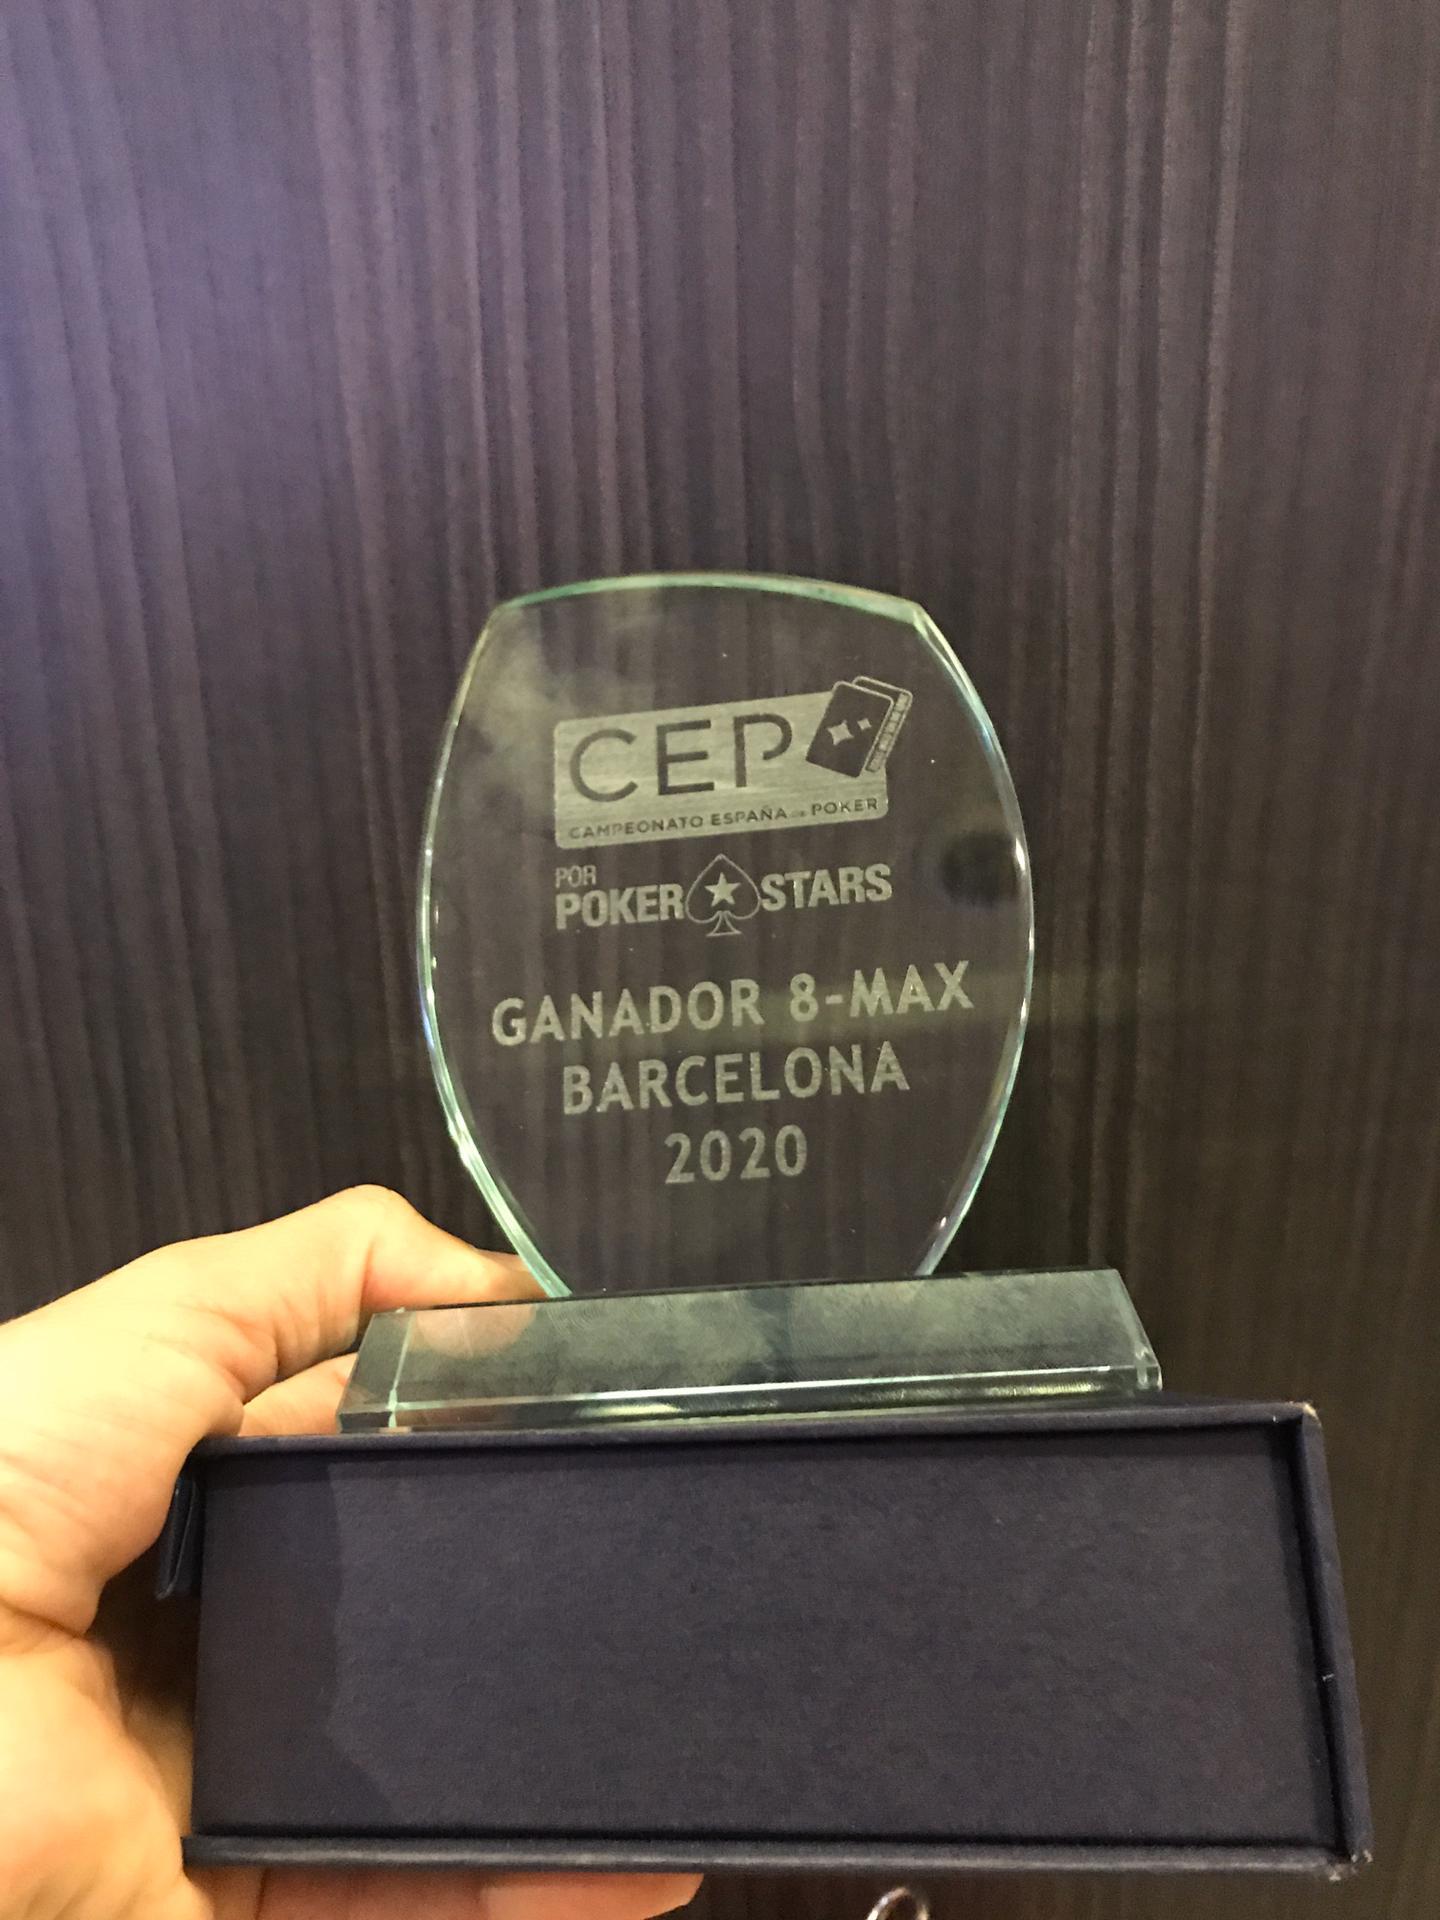 Troféu do 8-Max do CEP Barcelona